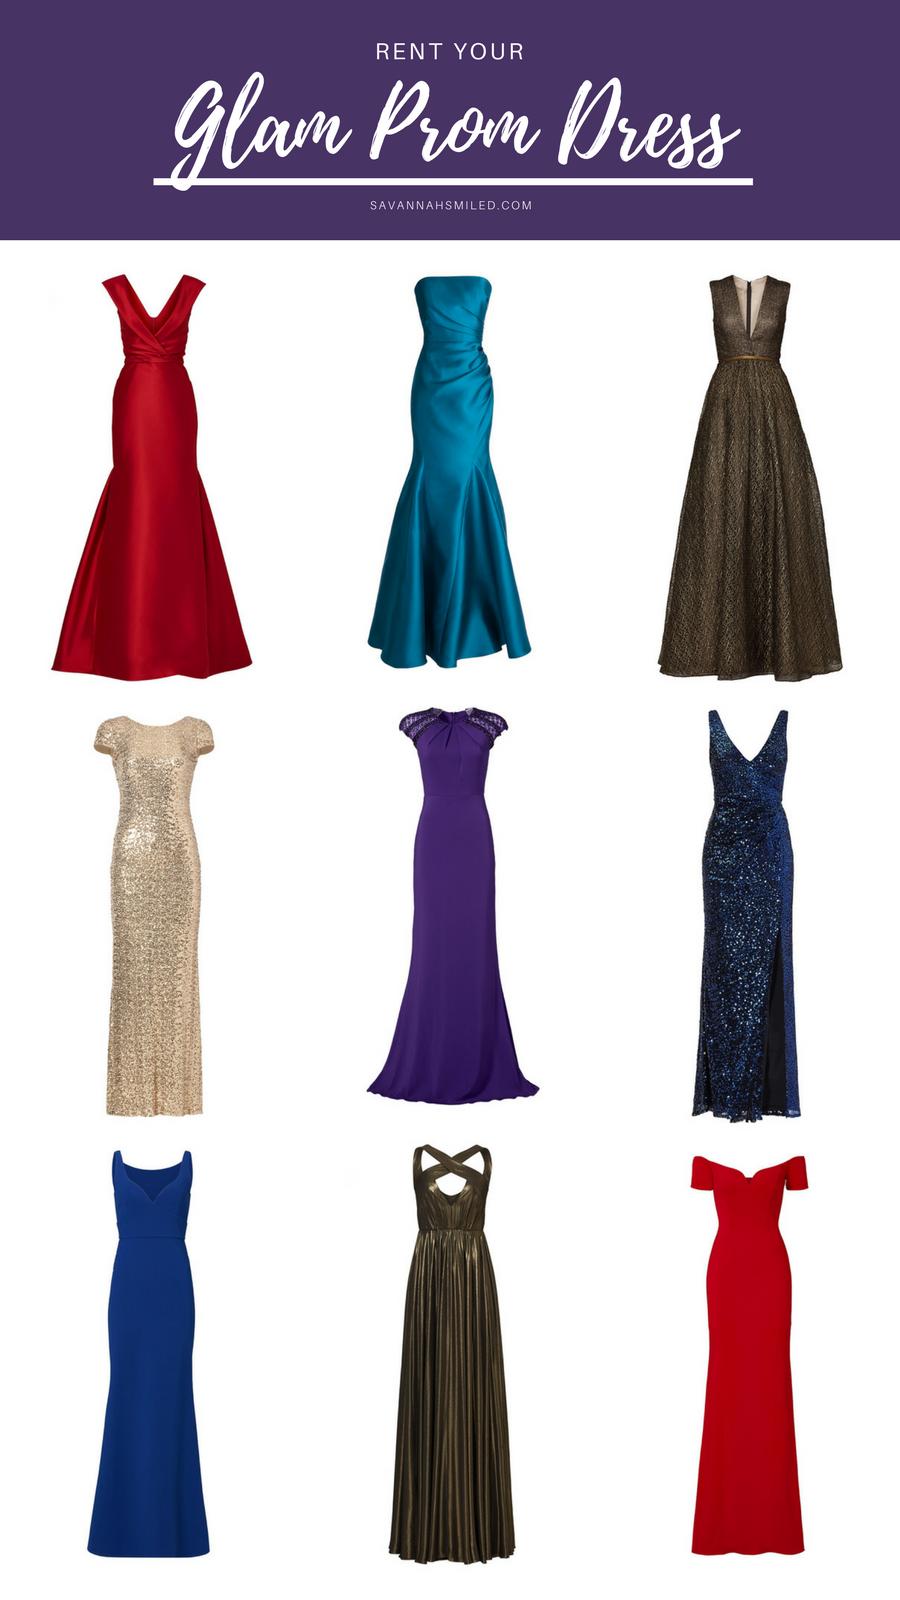 Rent The Glam Prom Dress — Savannah SMILED